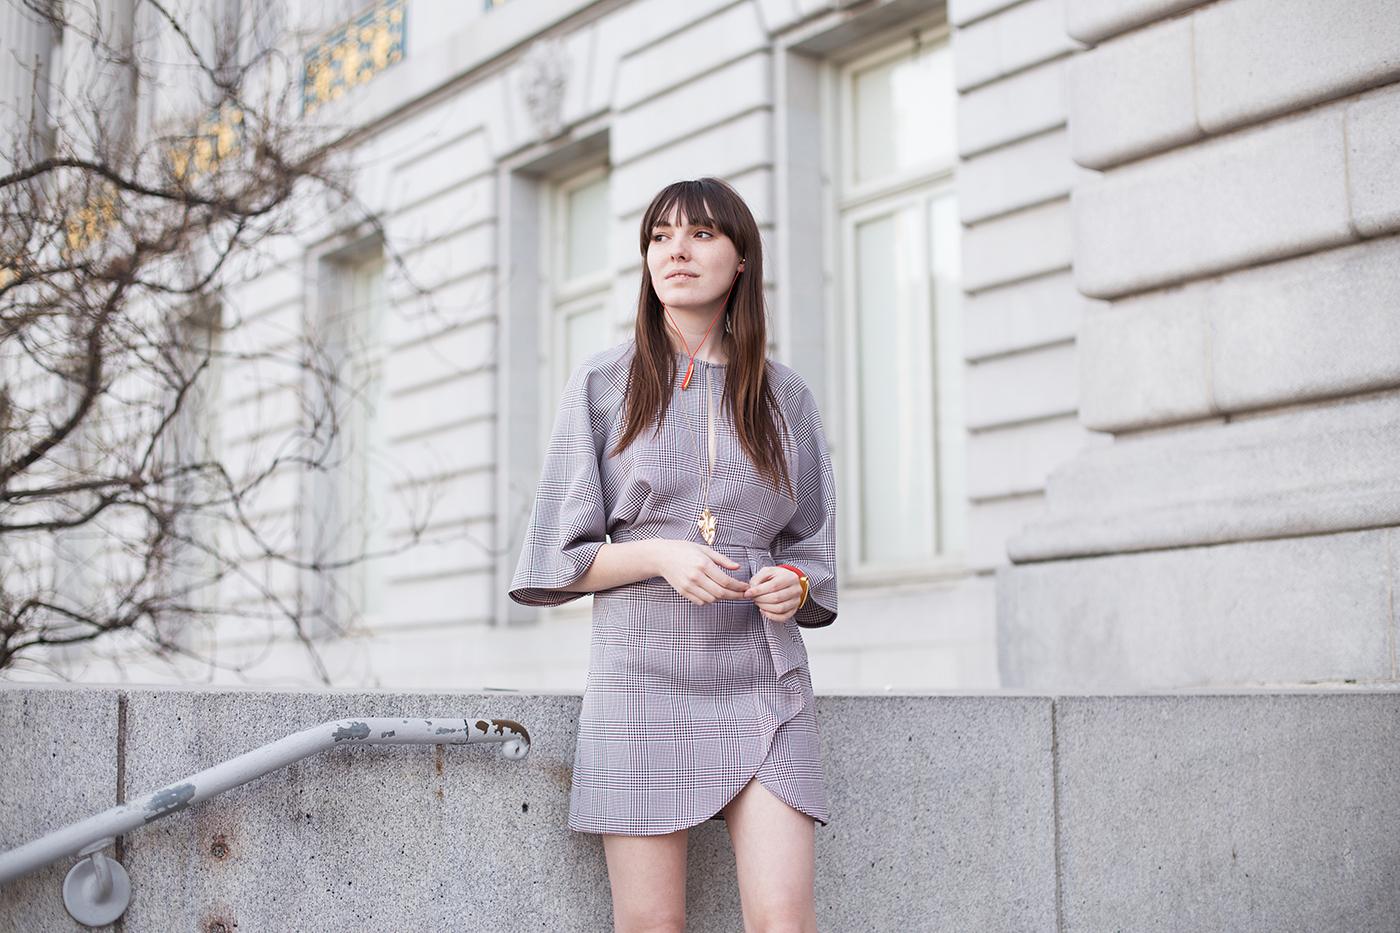 Branding and Art Direction: Ashley Chloe